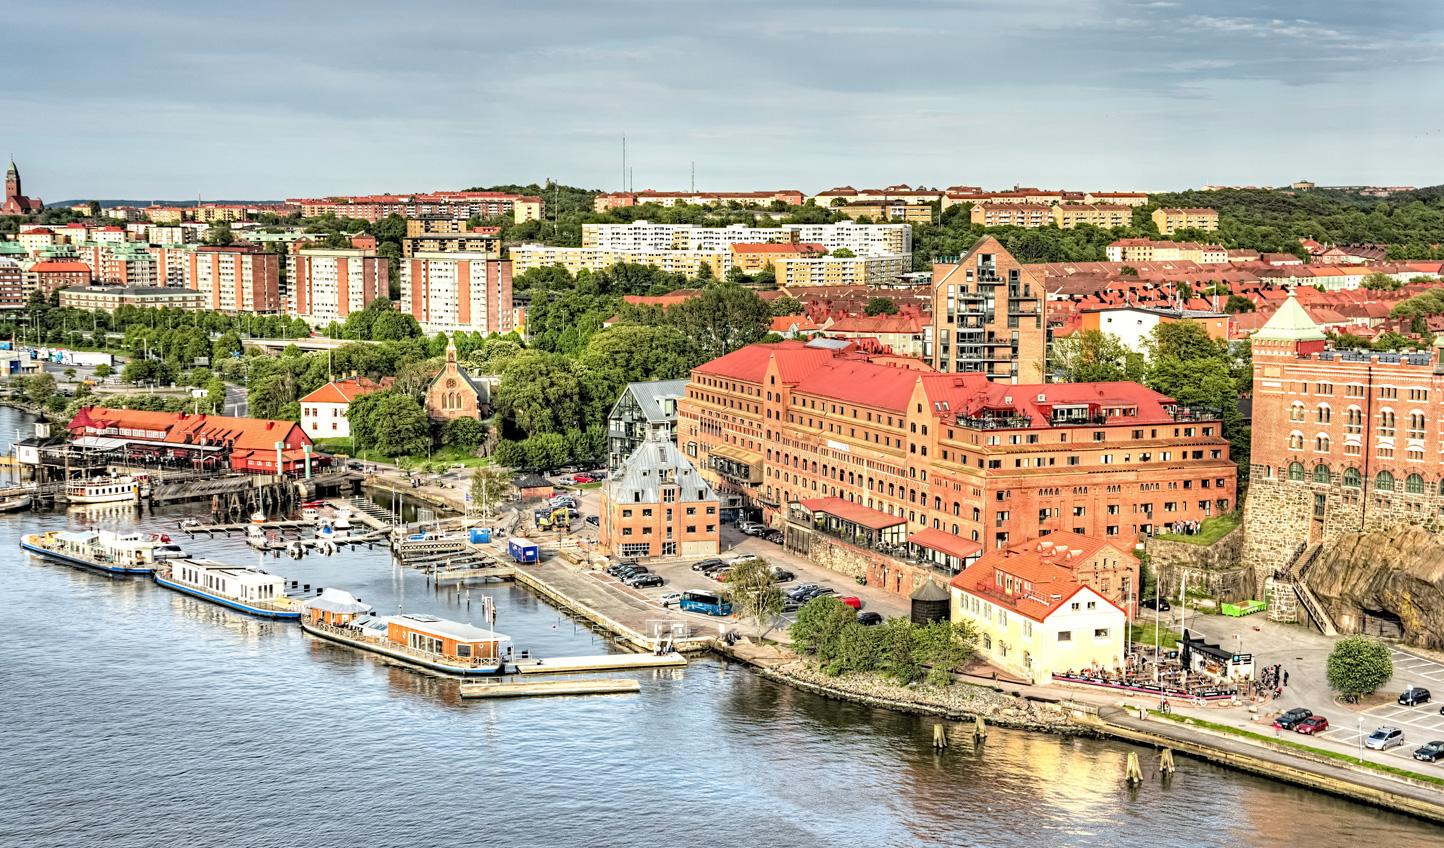 Move on to Gothenburg